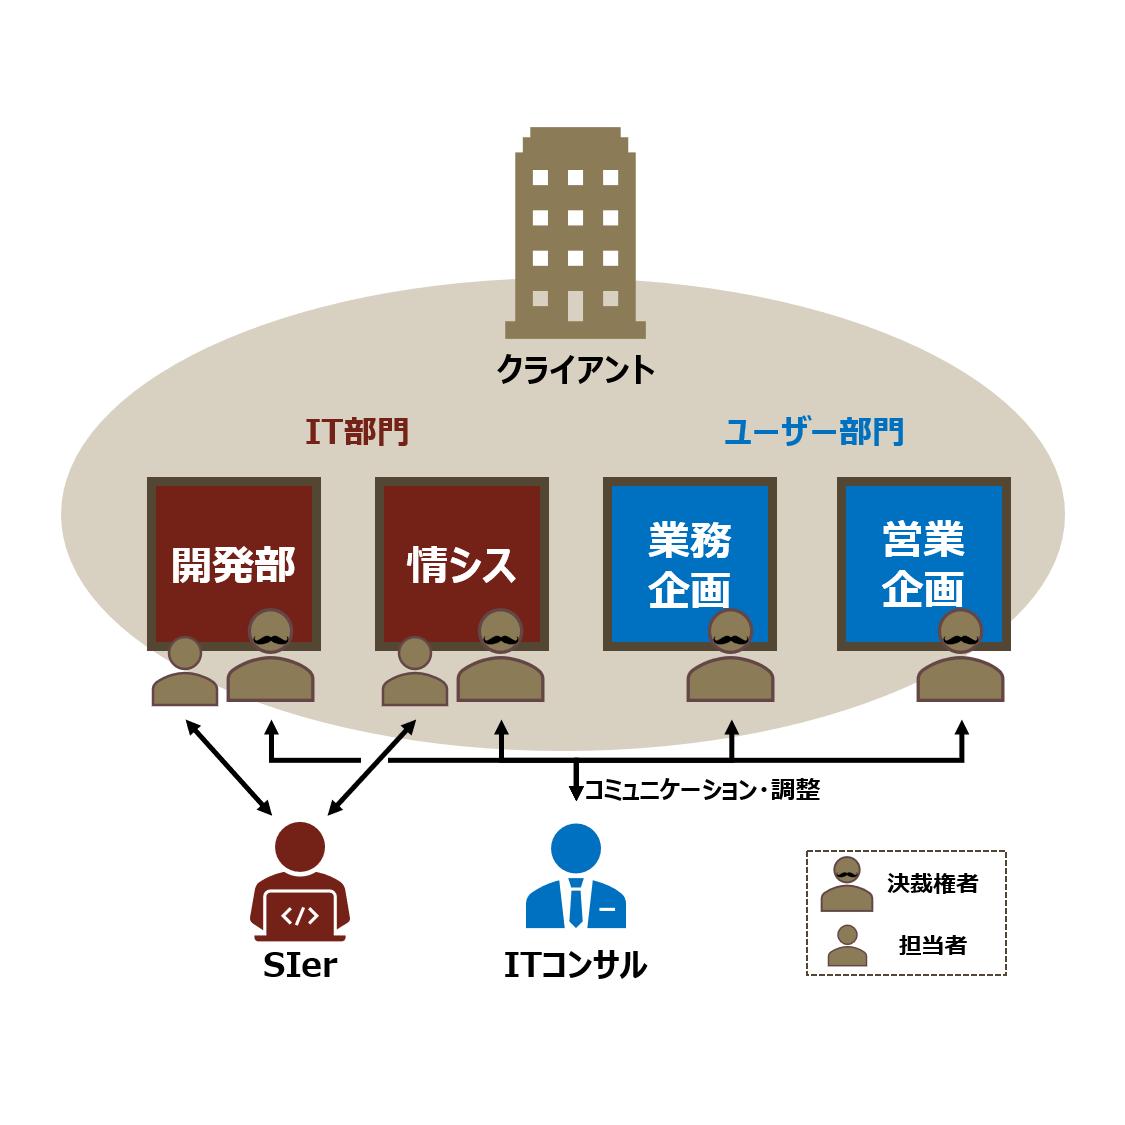 f:id:okui-ryo-assign:20200131002306p:plain:w400